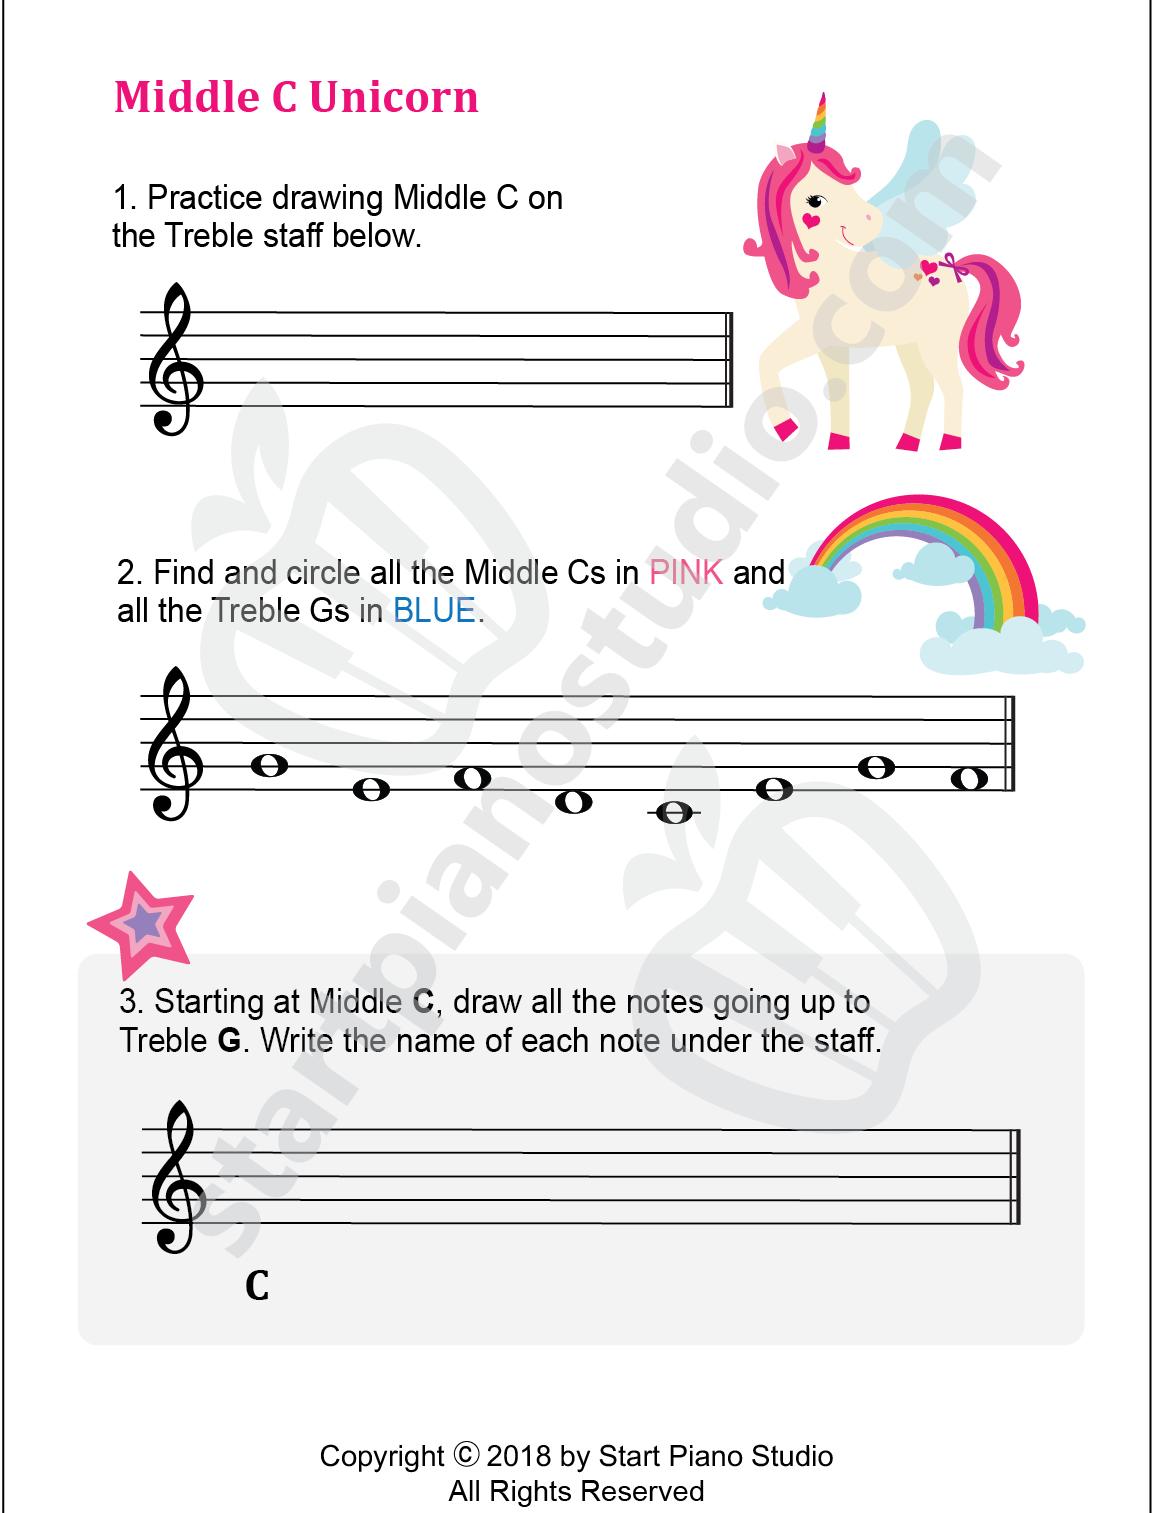 Middle C Unicorn Printable